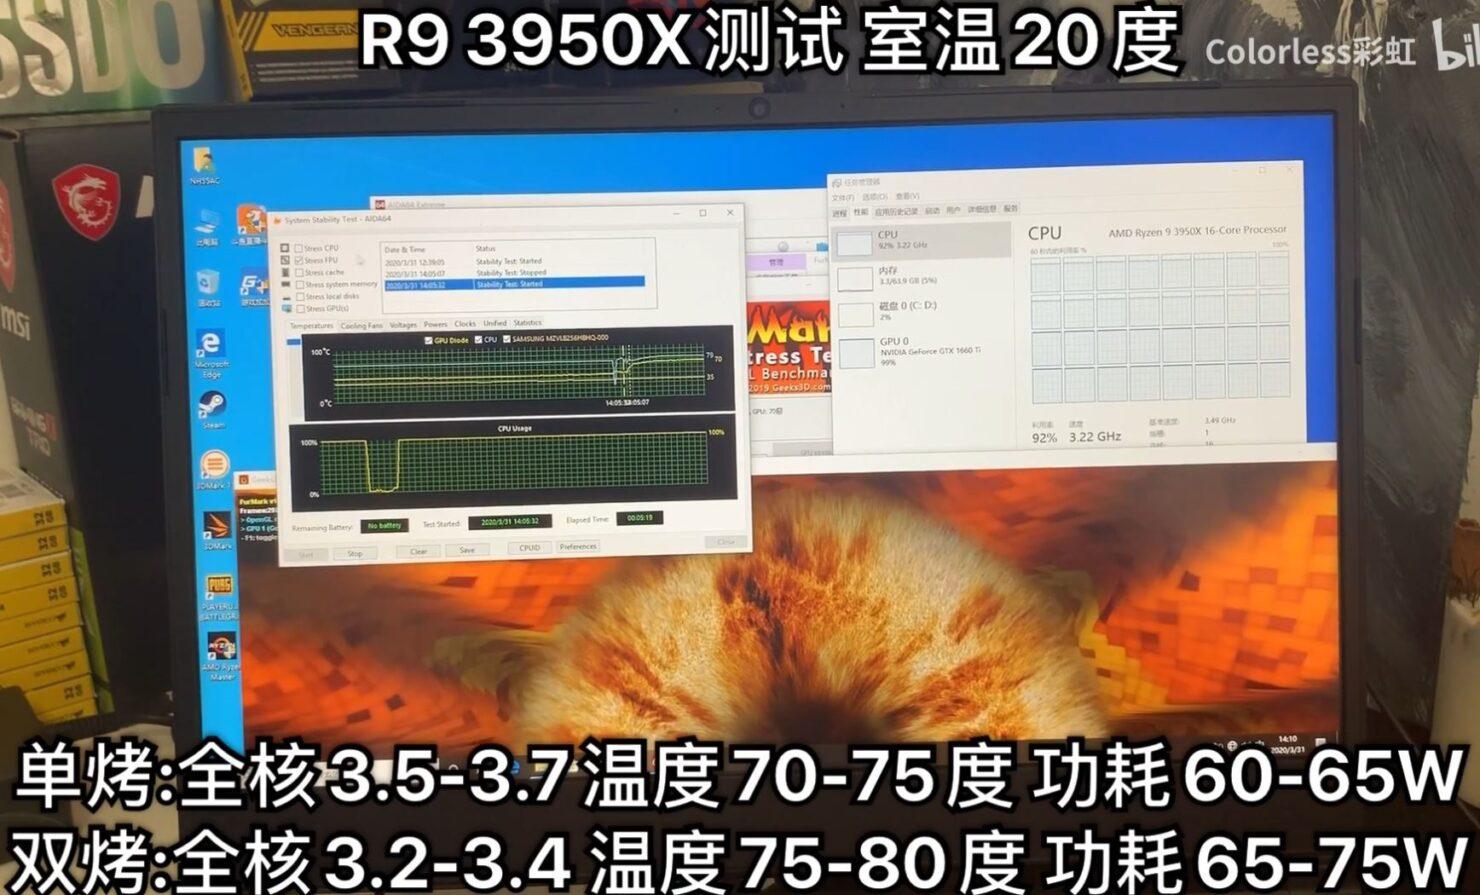 amd-ryzen-9-3950x-aida64-stress-test-power-consumption_1